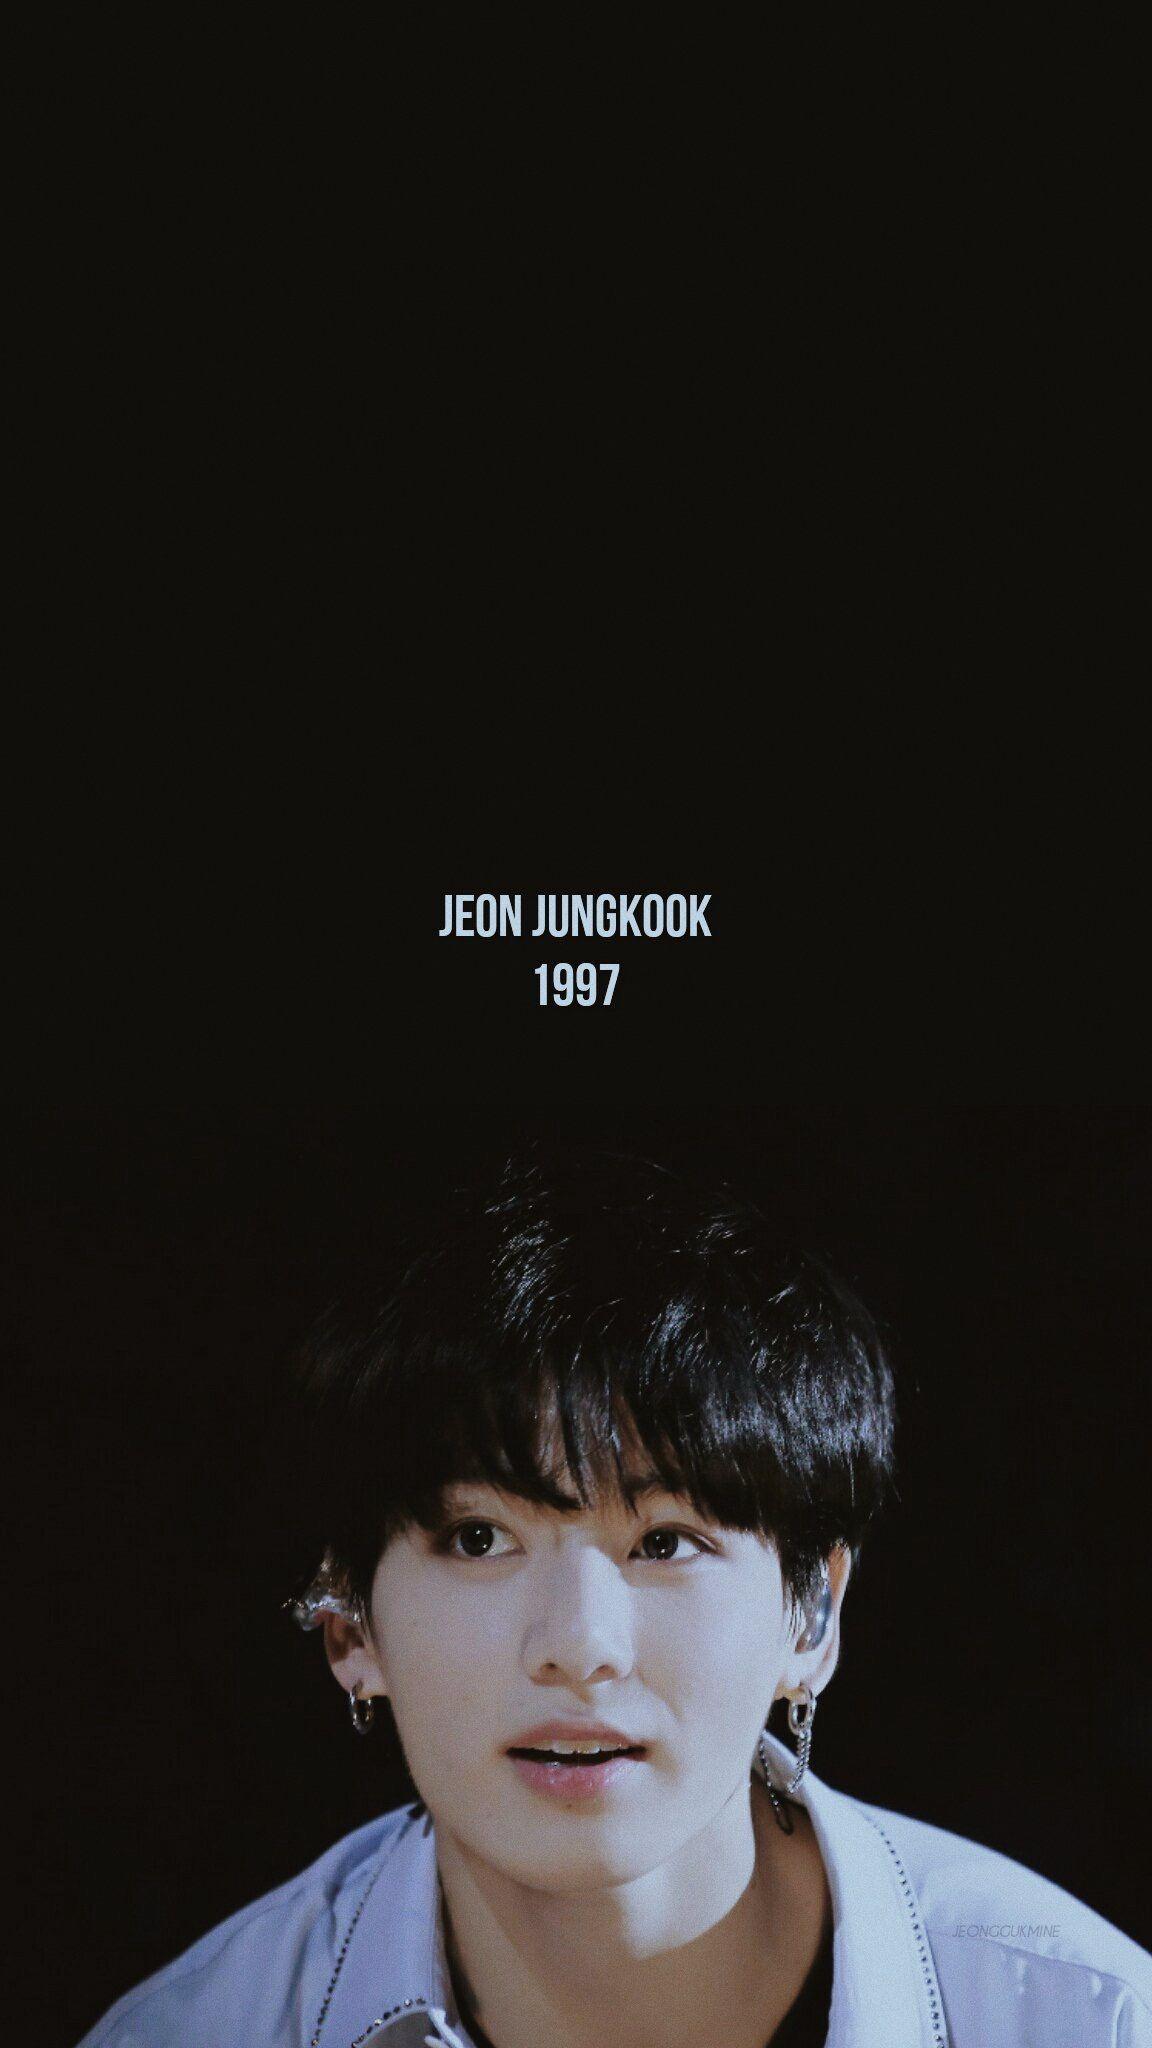 Jungkook Iphone Wallpaper   Never Seen Pics Of Jungkook 19317 1152x2048